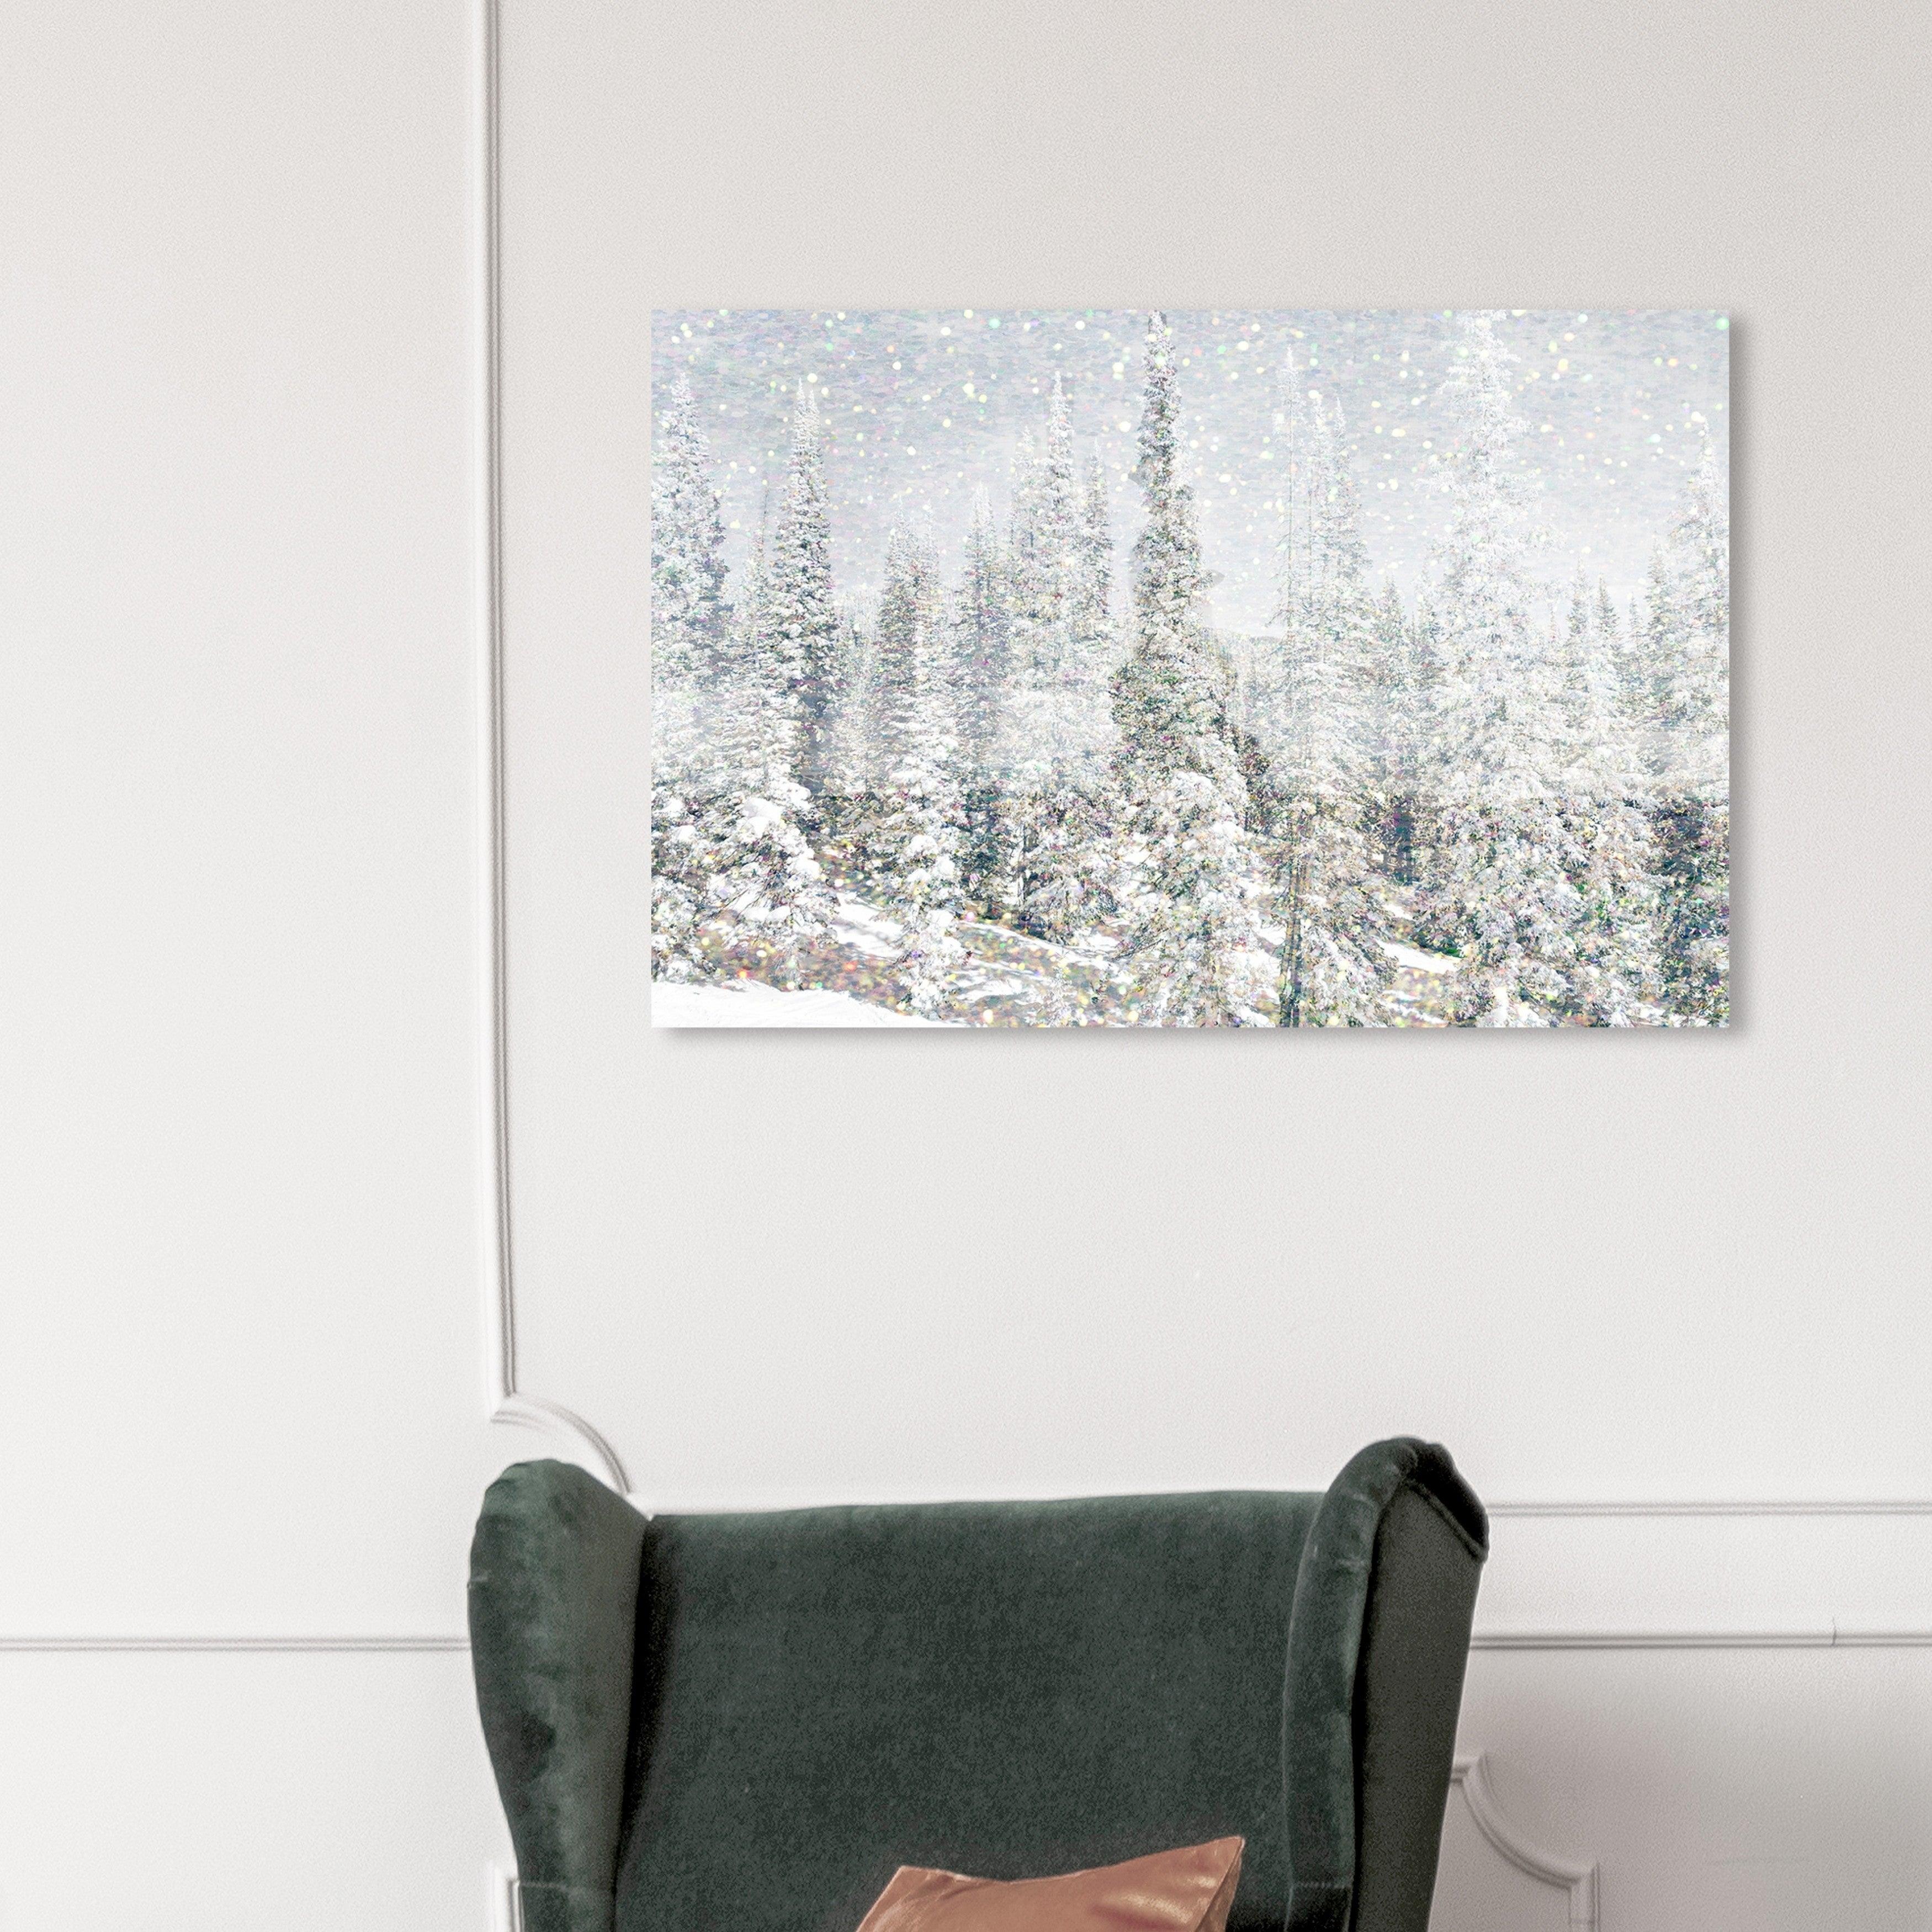 Wynwood Studio Holiday And Seasonal Wall Art Canvas Prints Magic Snow Trees Winter Home Decor Gray White Overstock 30261543